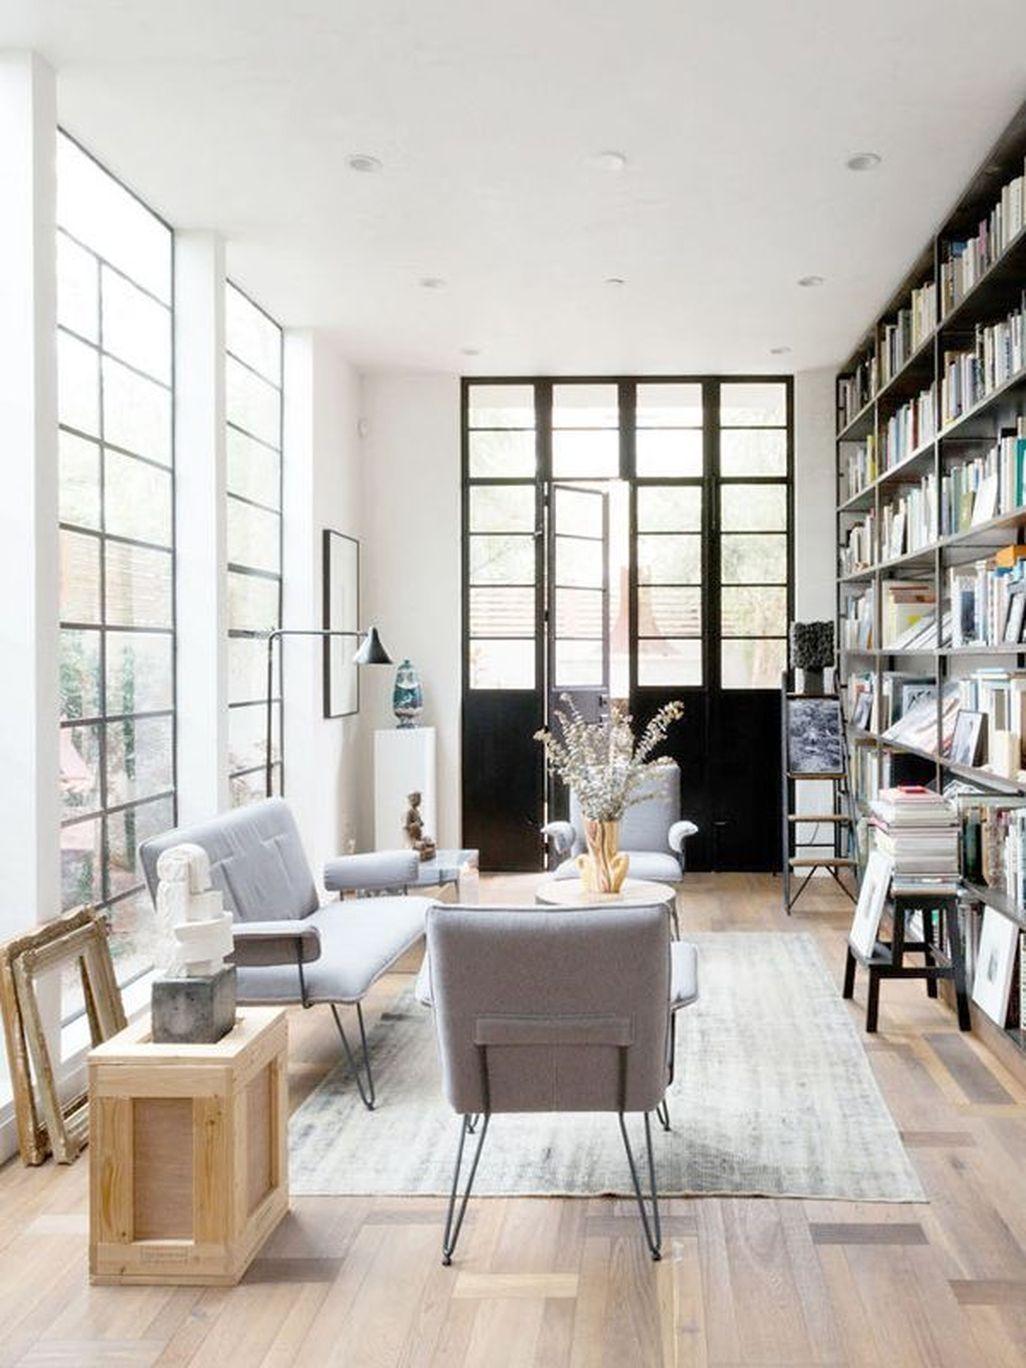 41 Modern Big Living Room Decorating Ideas | Pinterest | Big living ...